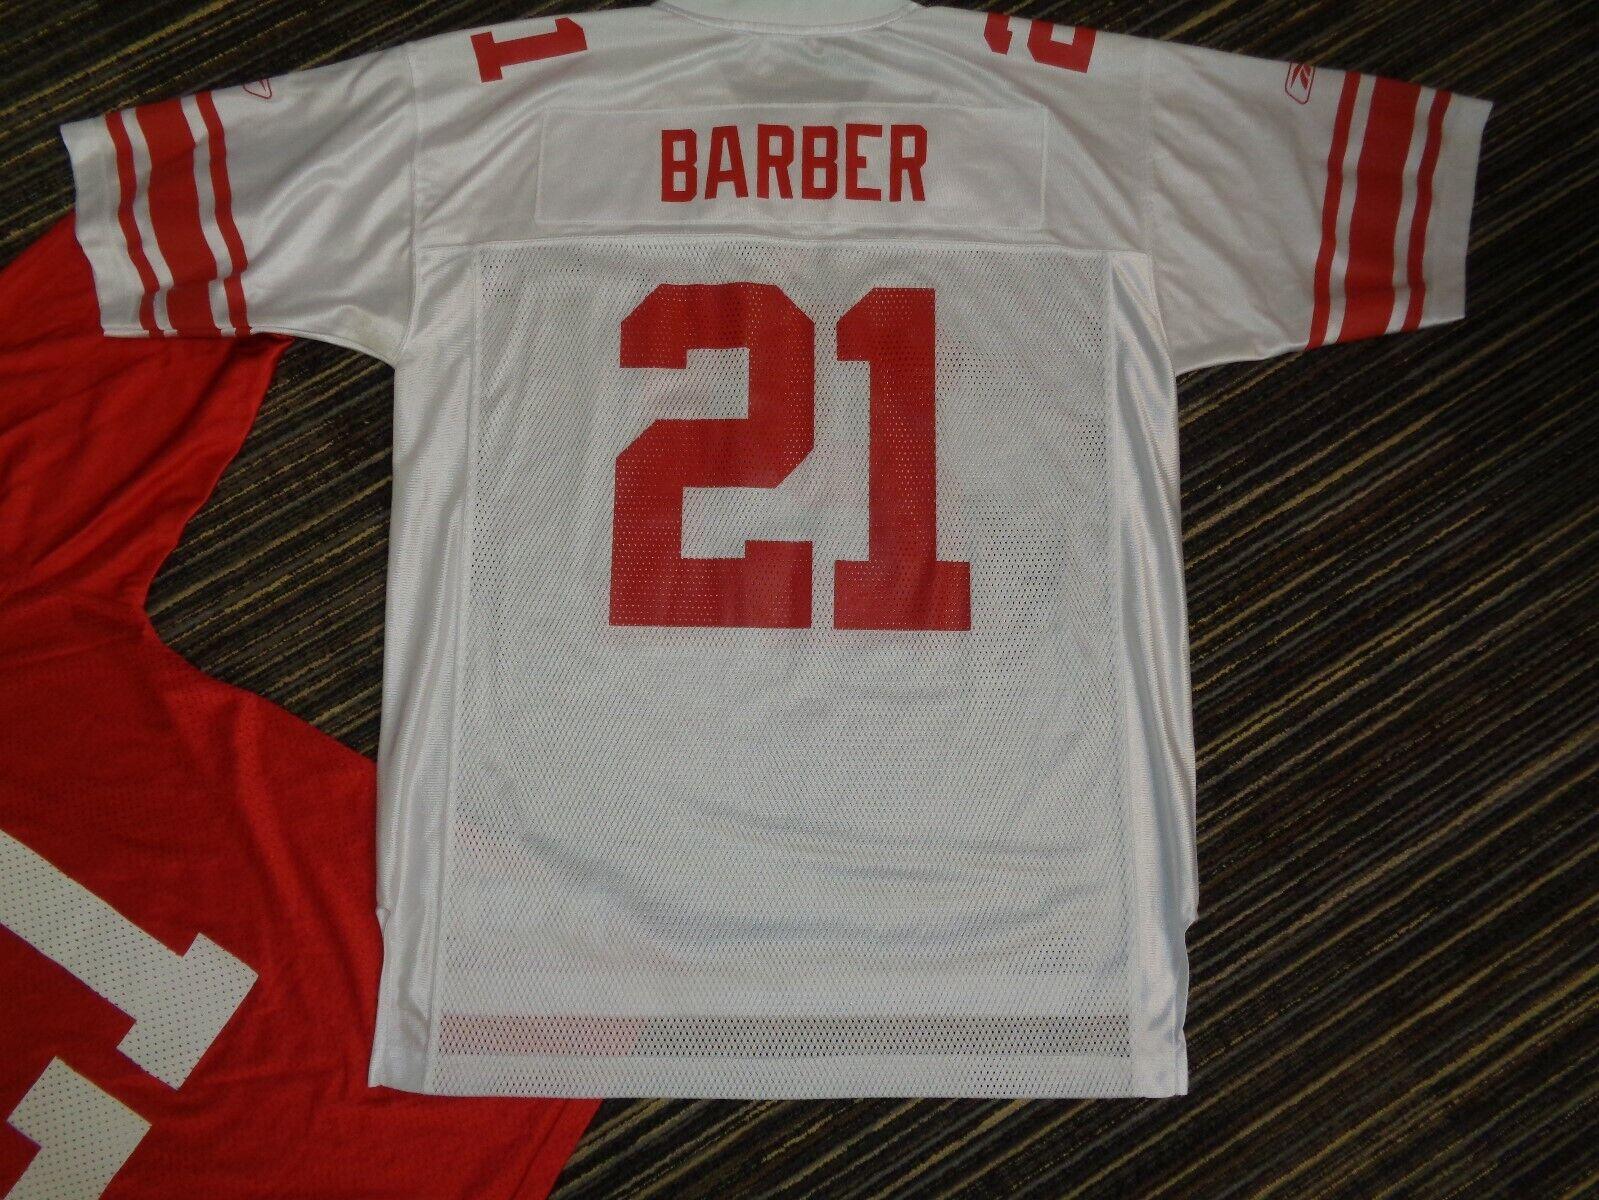 LOT 2-TIKI BARBER 21 NY NEW YORK GIANTS REEBOK NIKE NFL GAME FOOTBALL JERSEYS L - $39.99